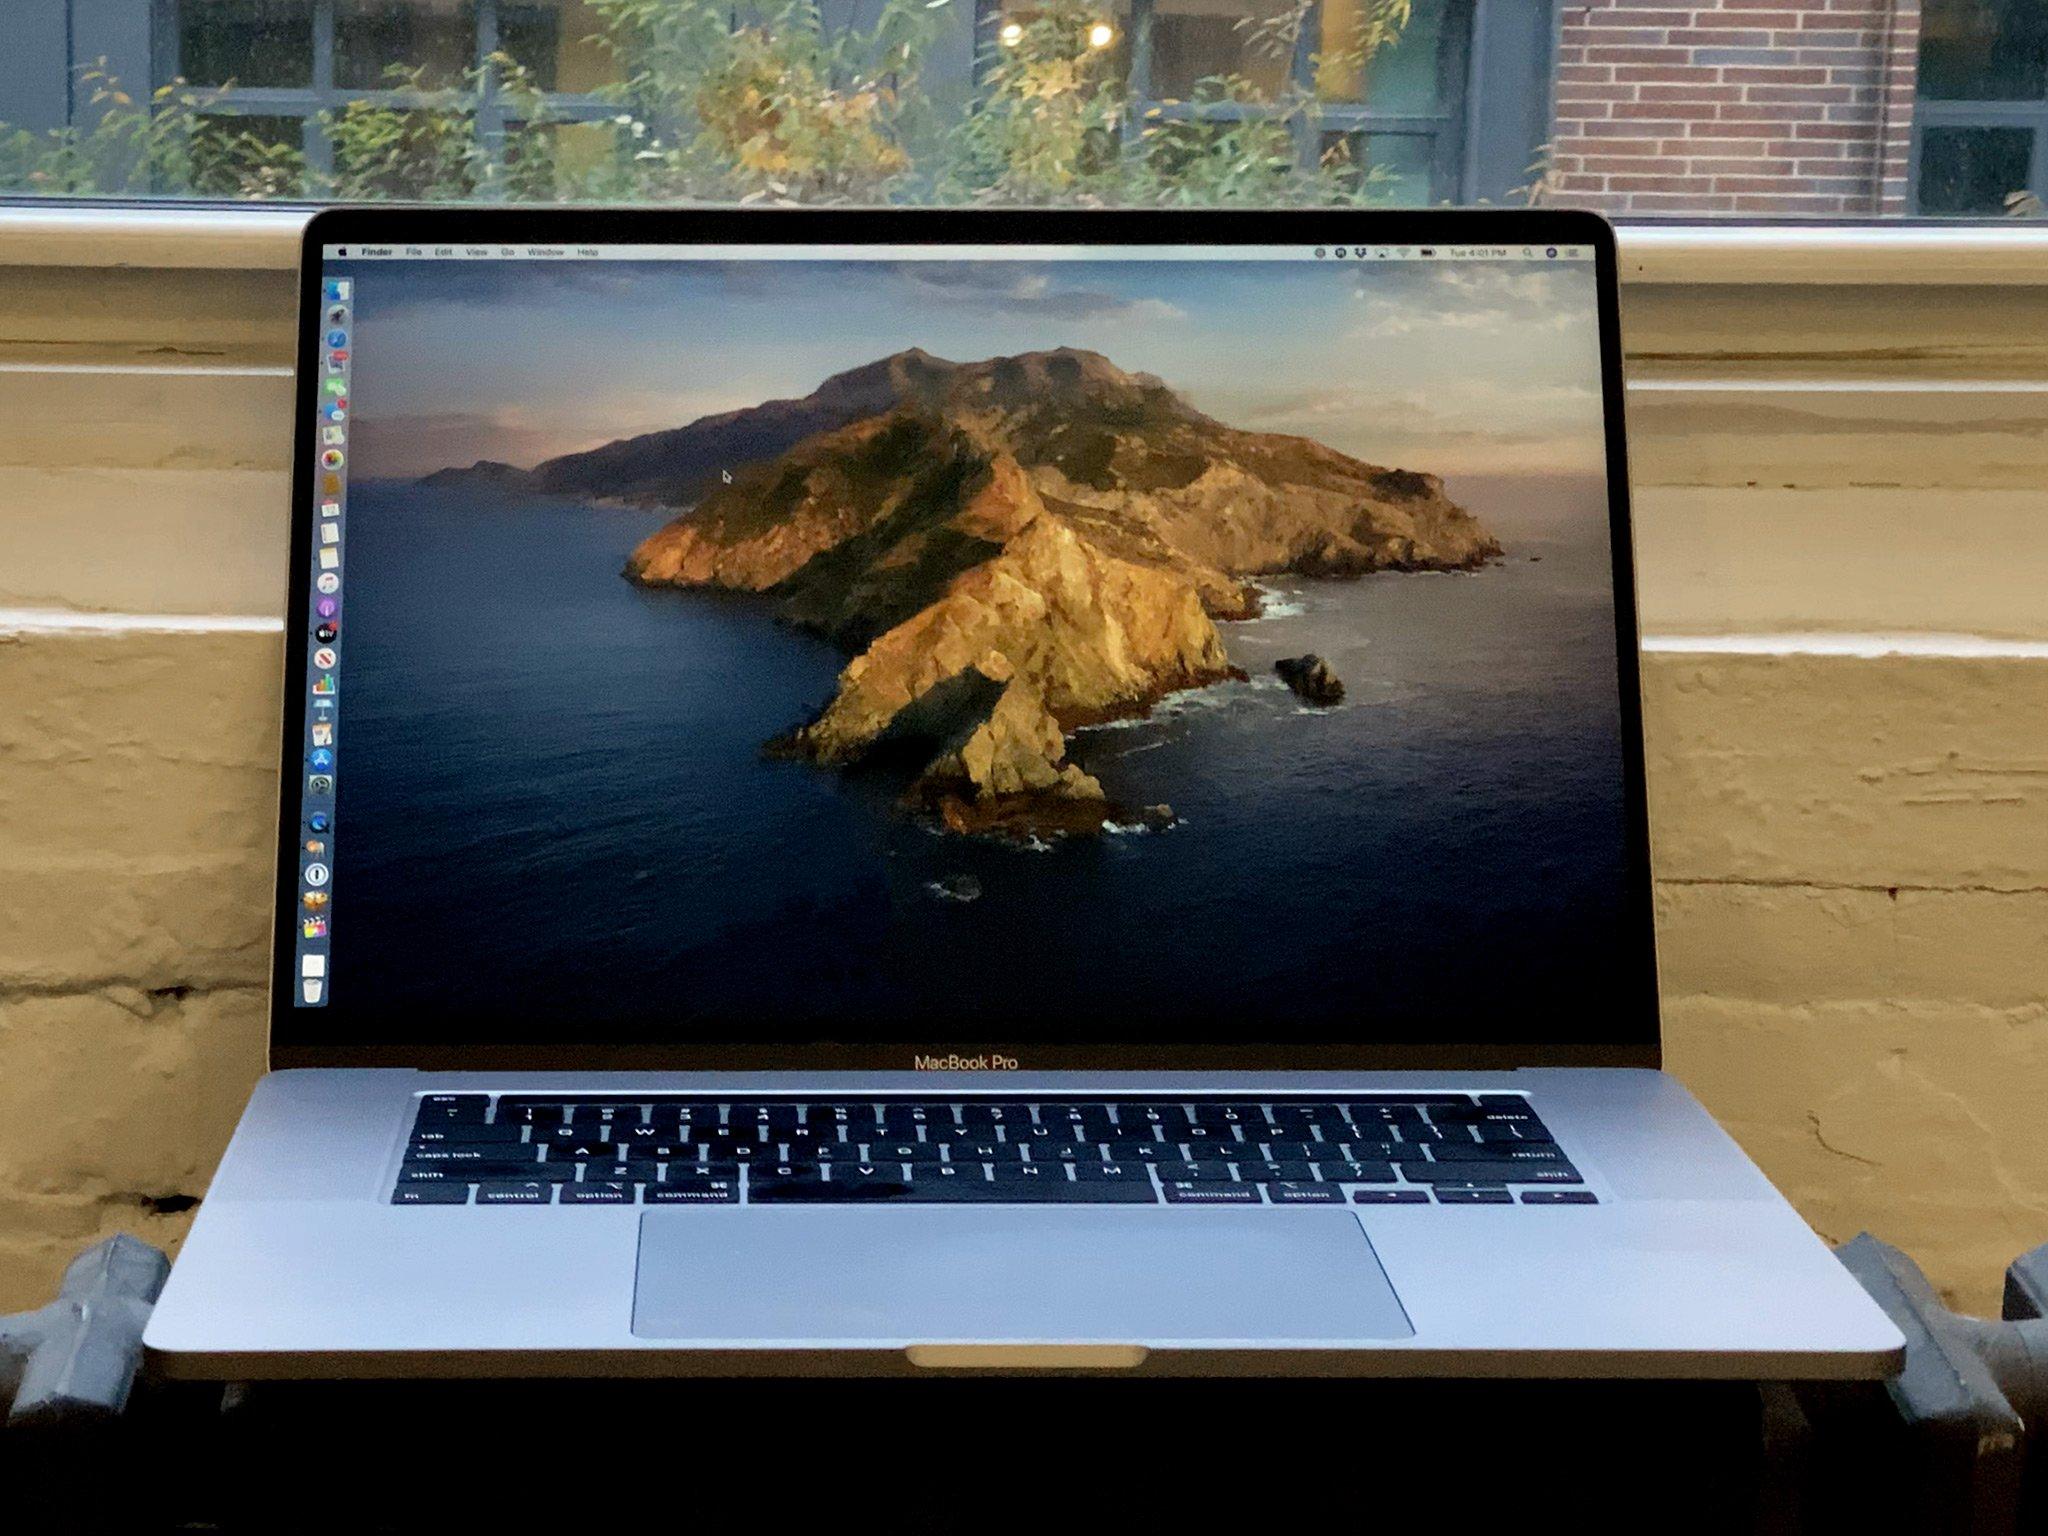 Macos Sierra Apple Macbook Pro 16 Inch 2048x1536 Download Hd Wallpaper Wallpapertip